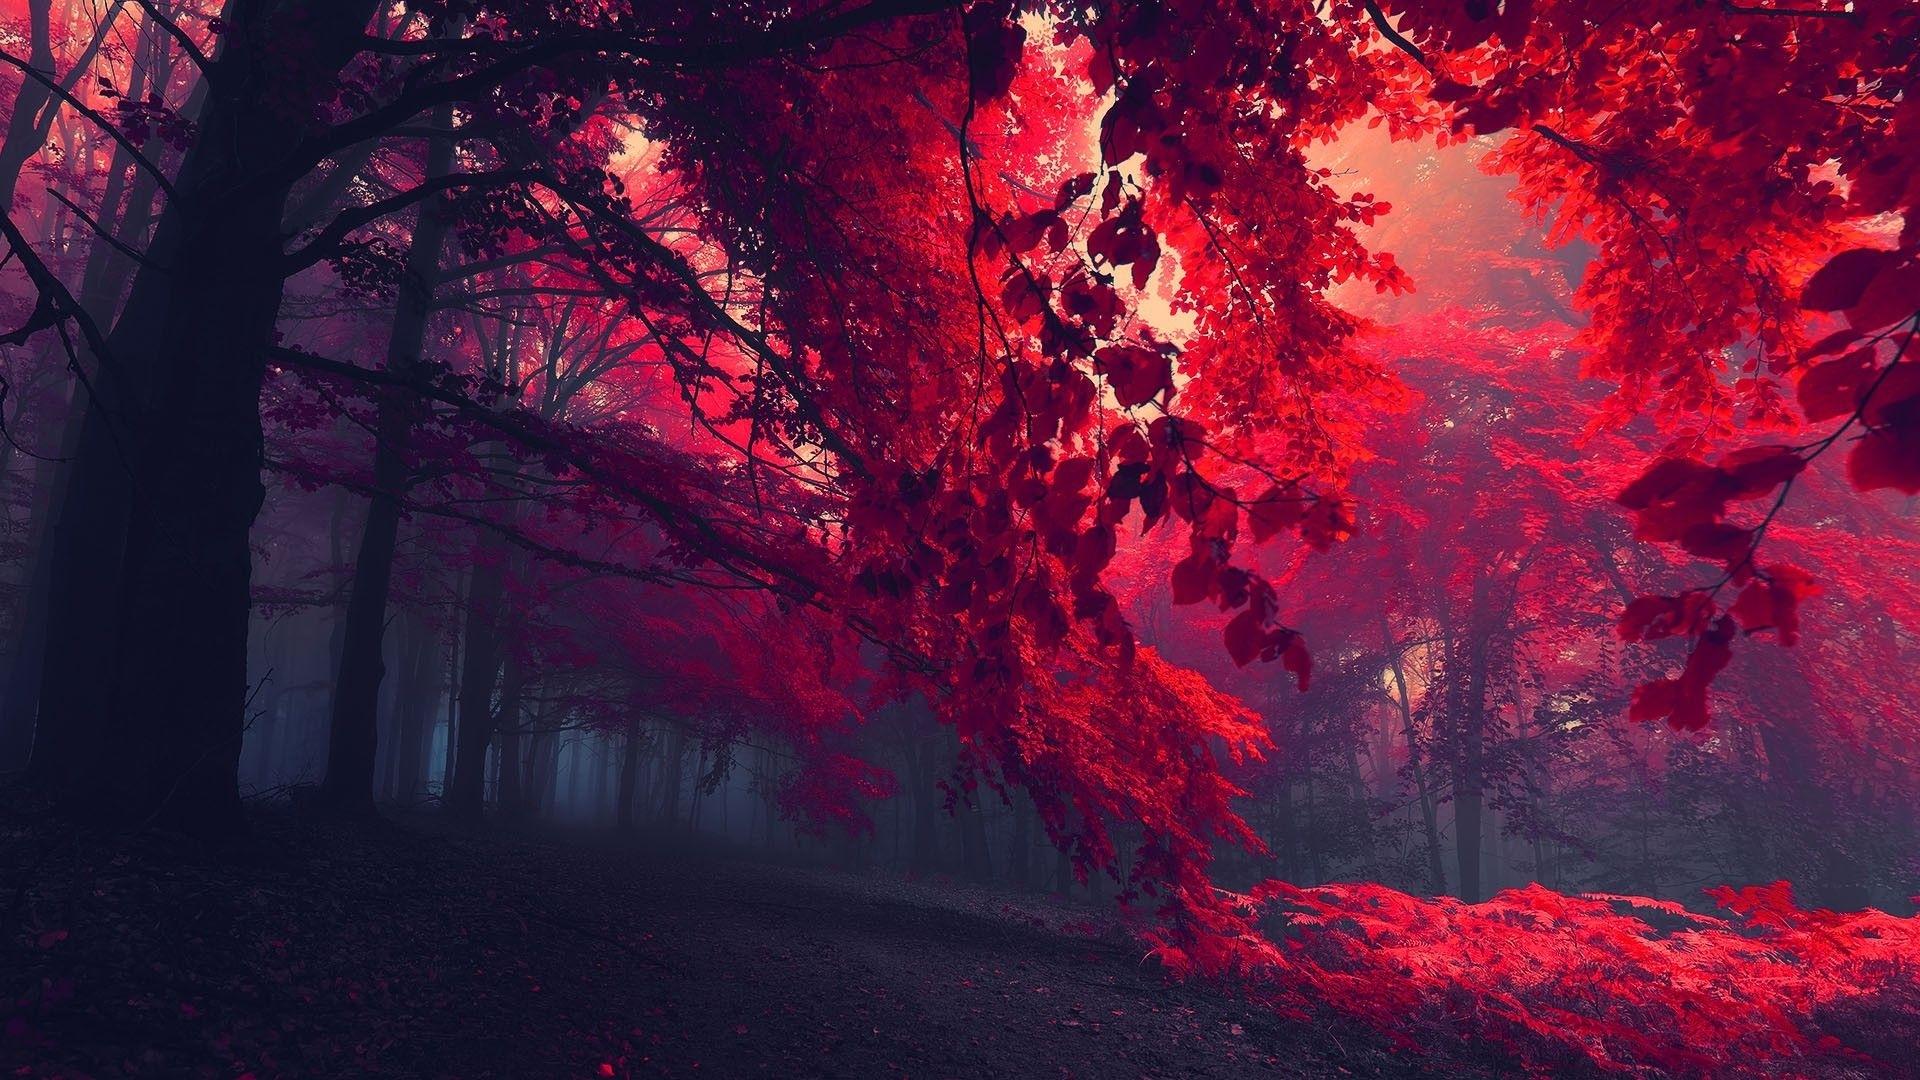 red forest trees hd wallpaper » fullhdwpp - full hd wallpapers 1920x1080